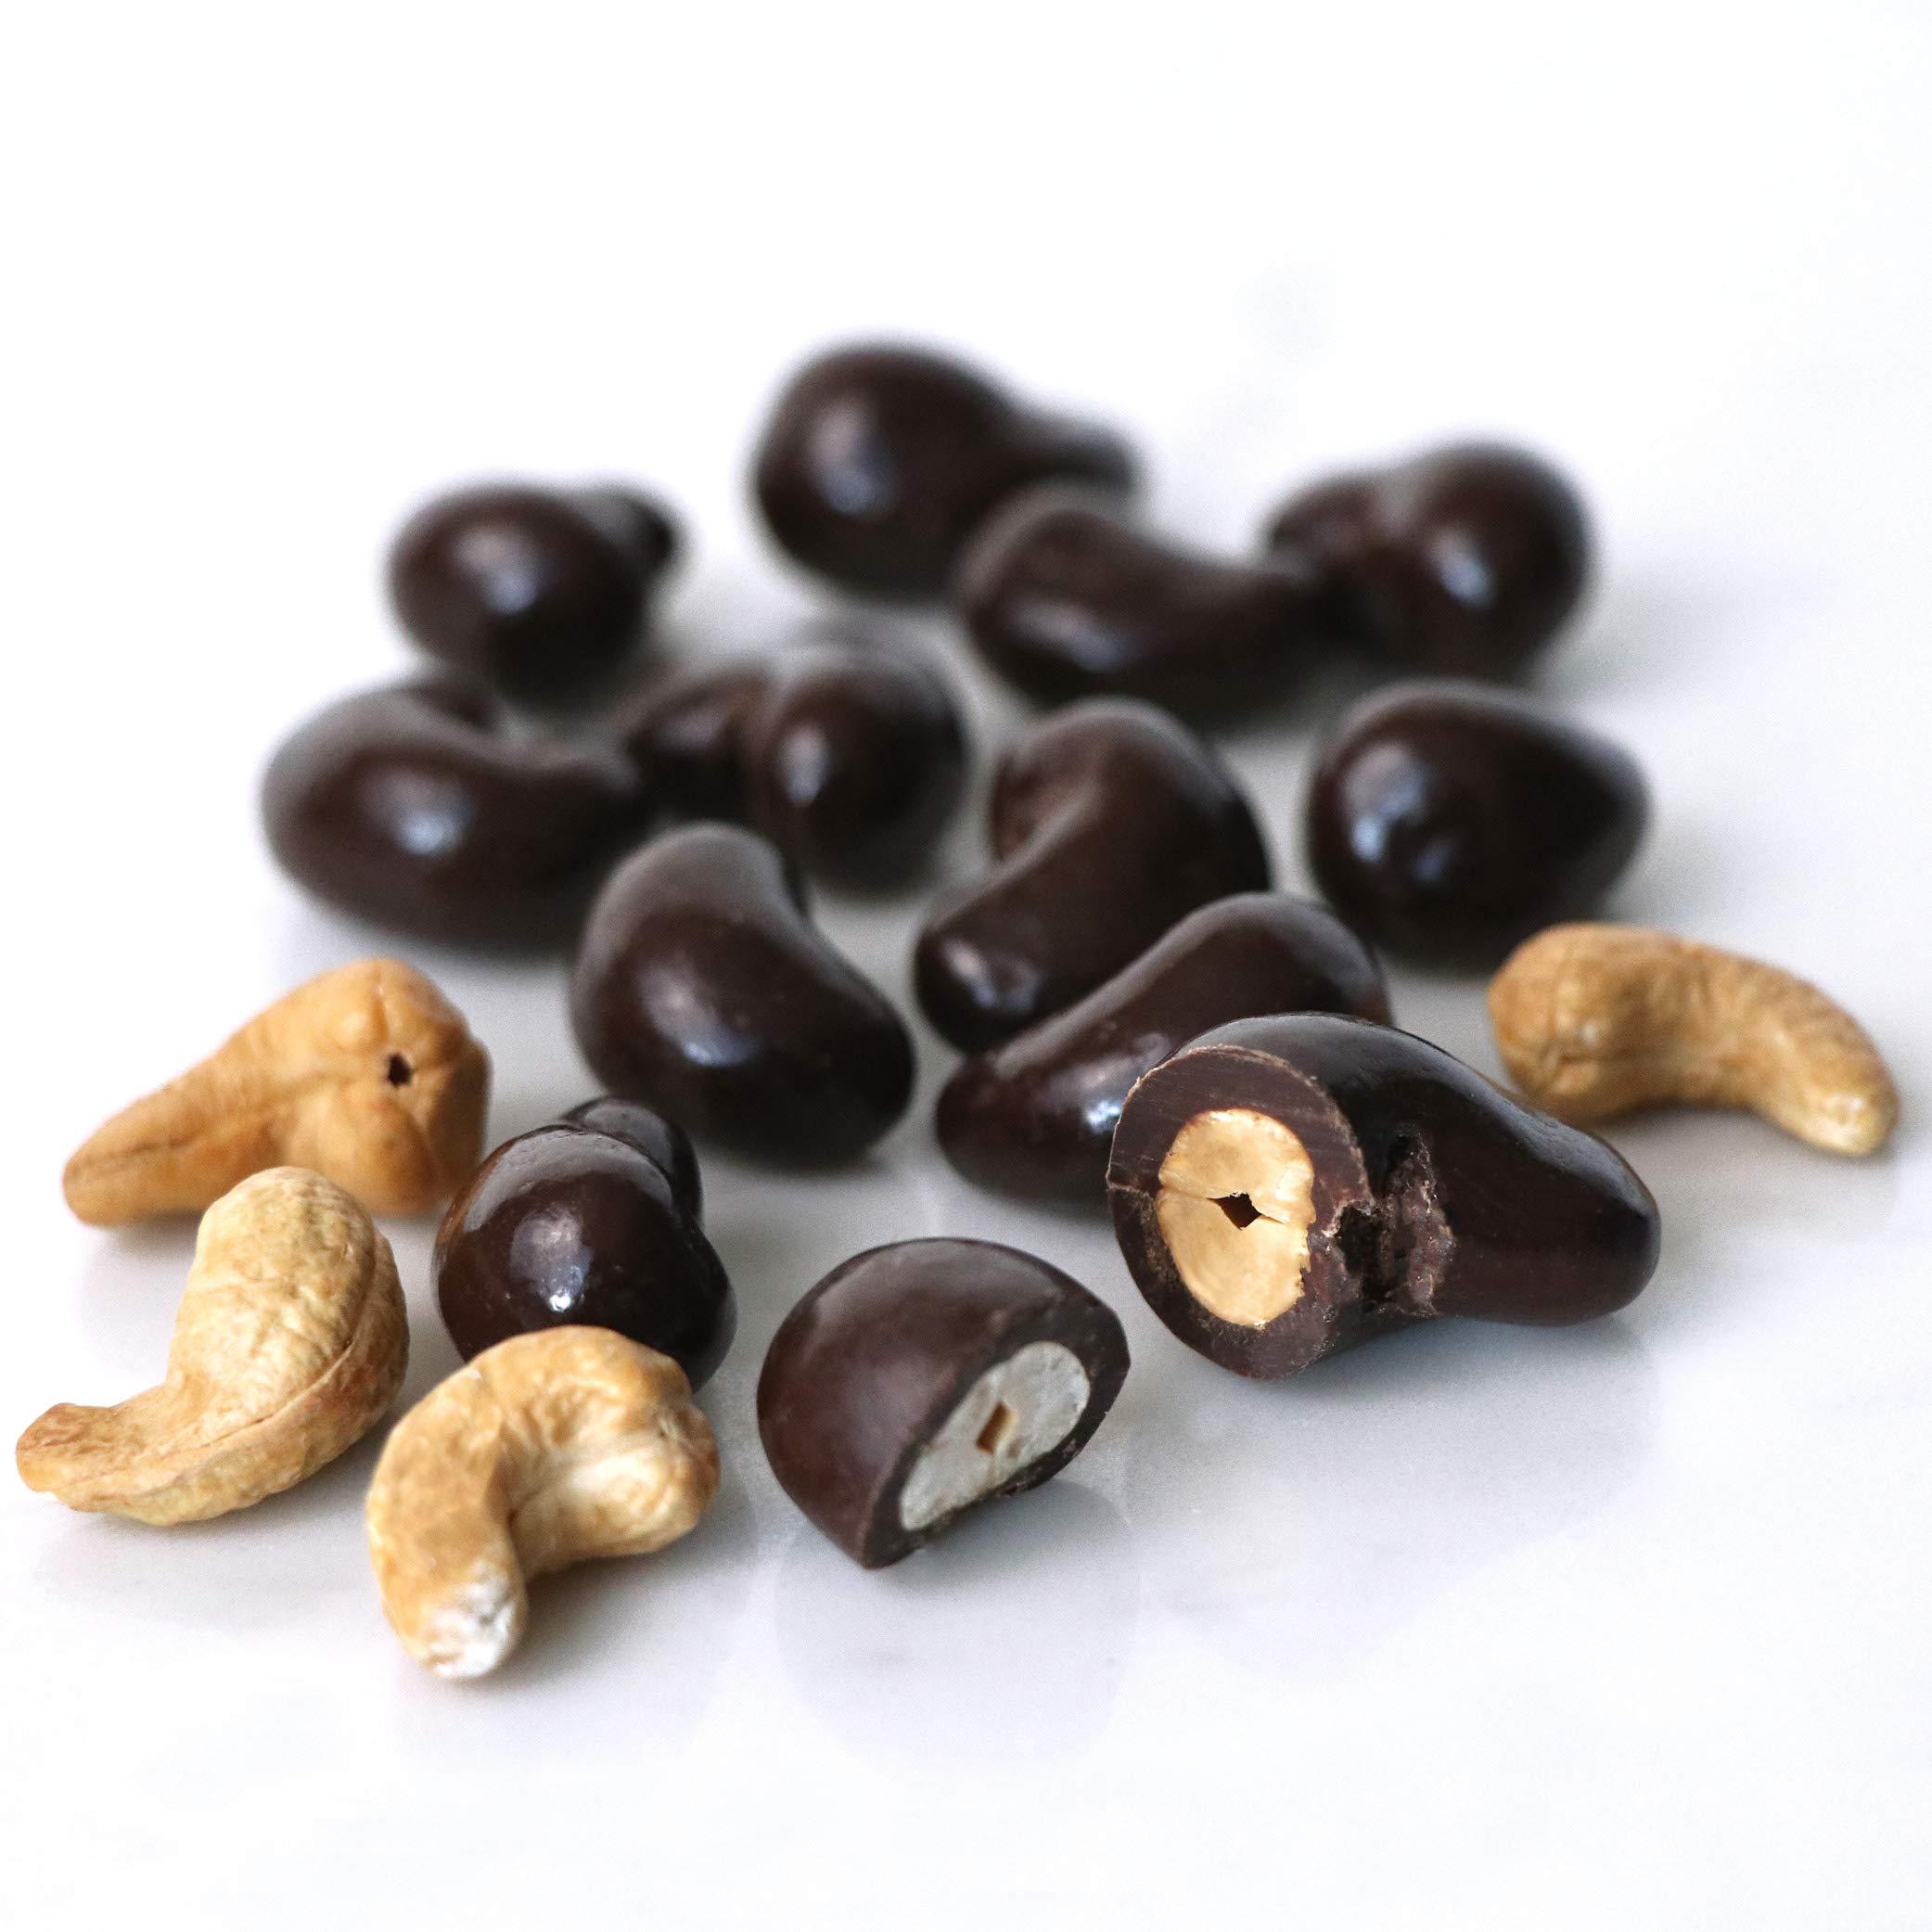 Marich Premium Dark Chocolate Sea Salt Cashews, 2.3-Ounce (Pack of 12) by Marich